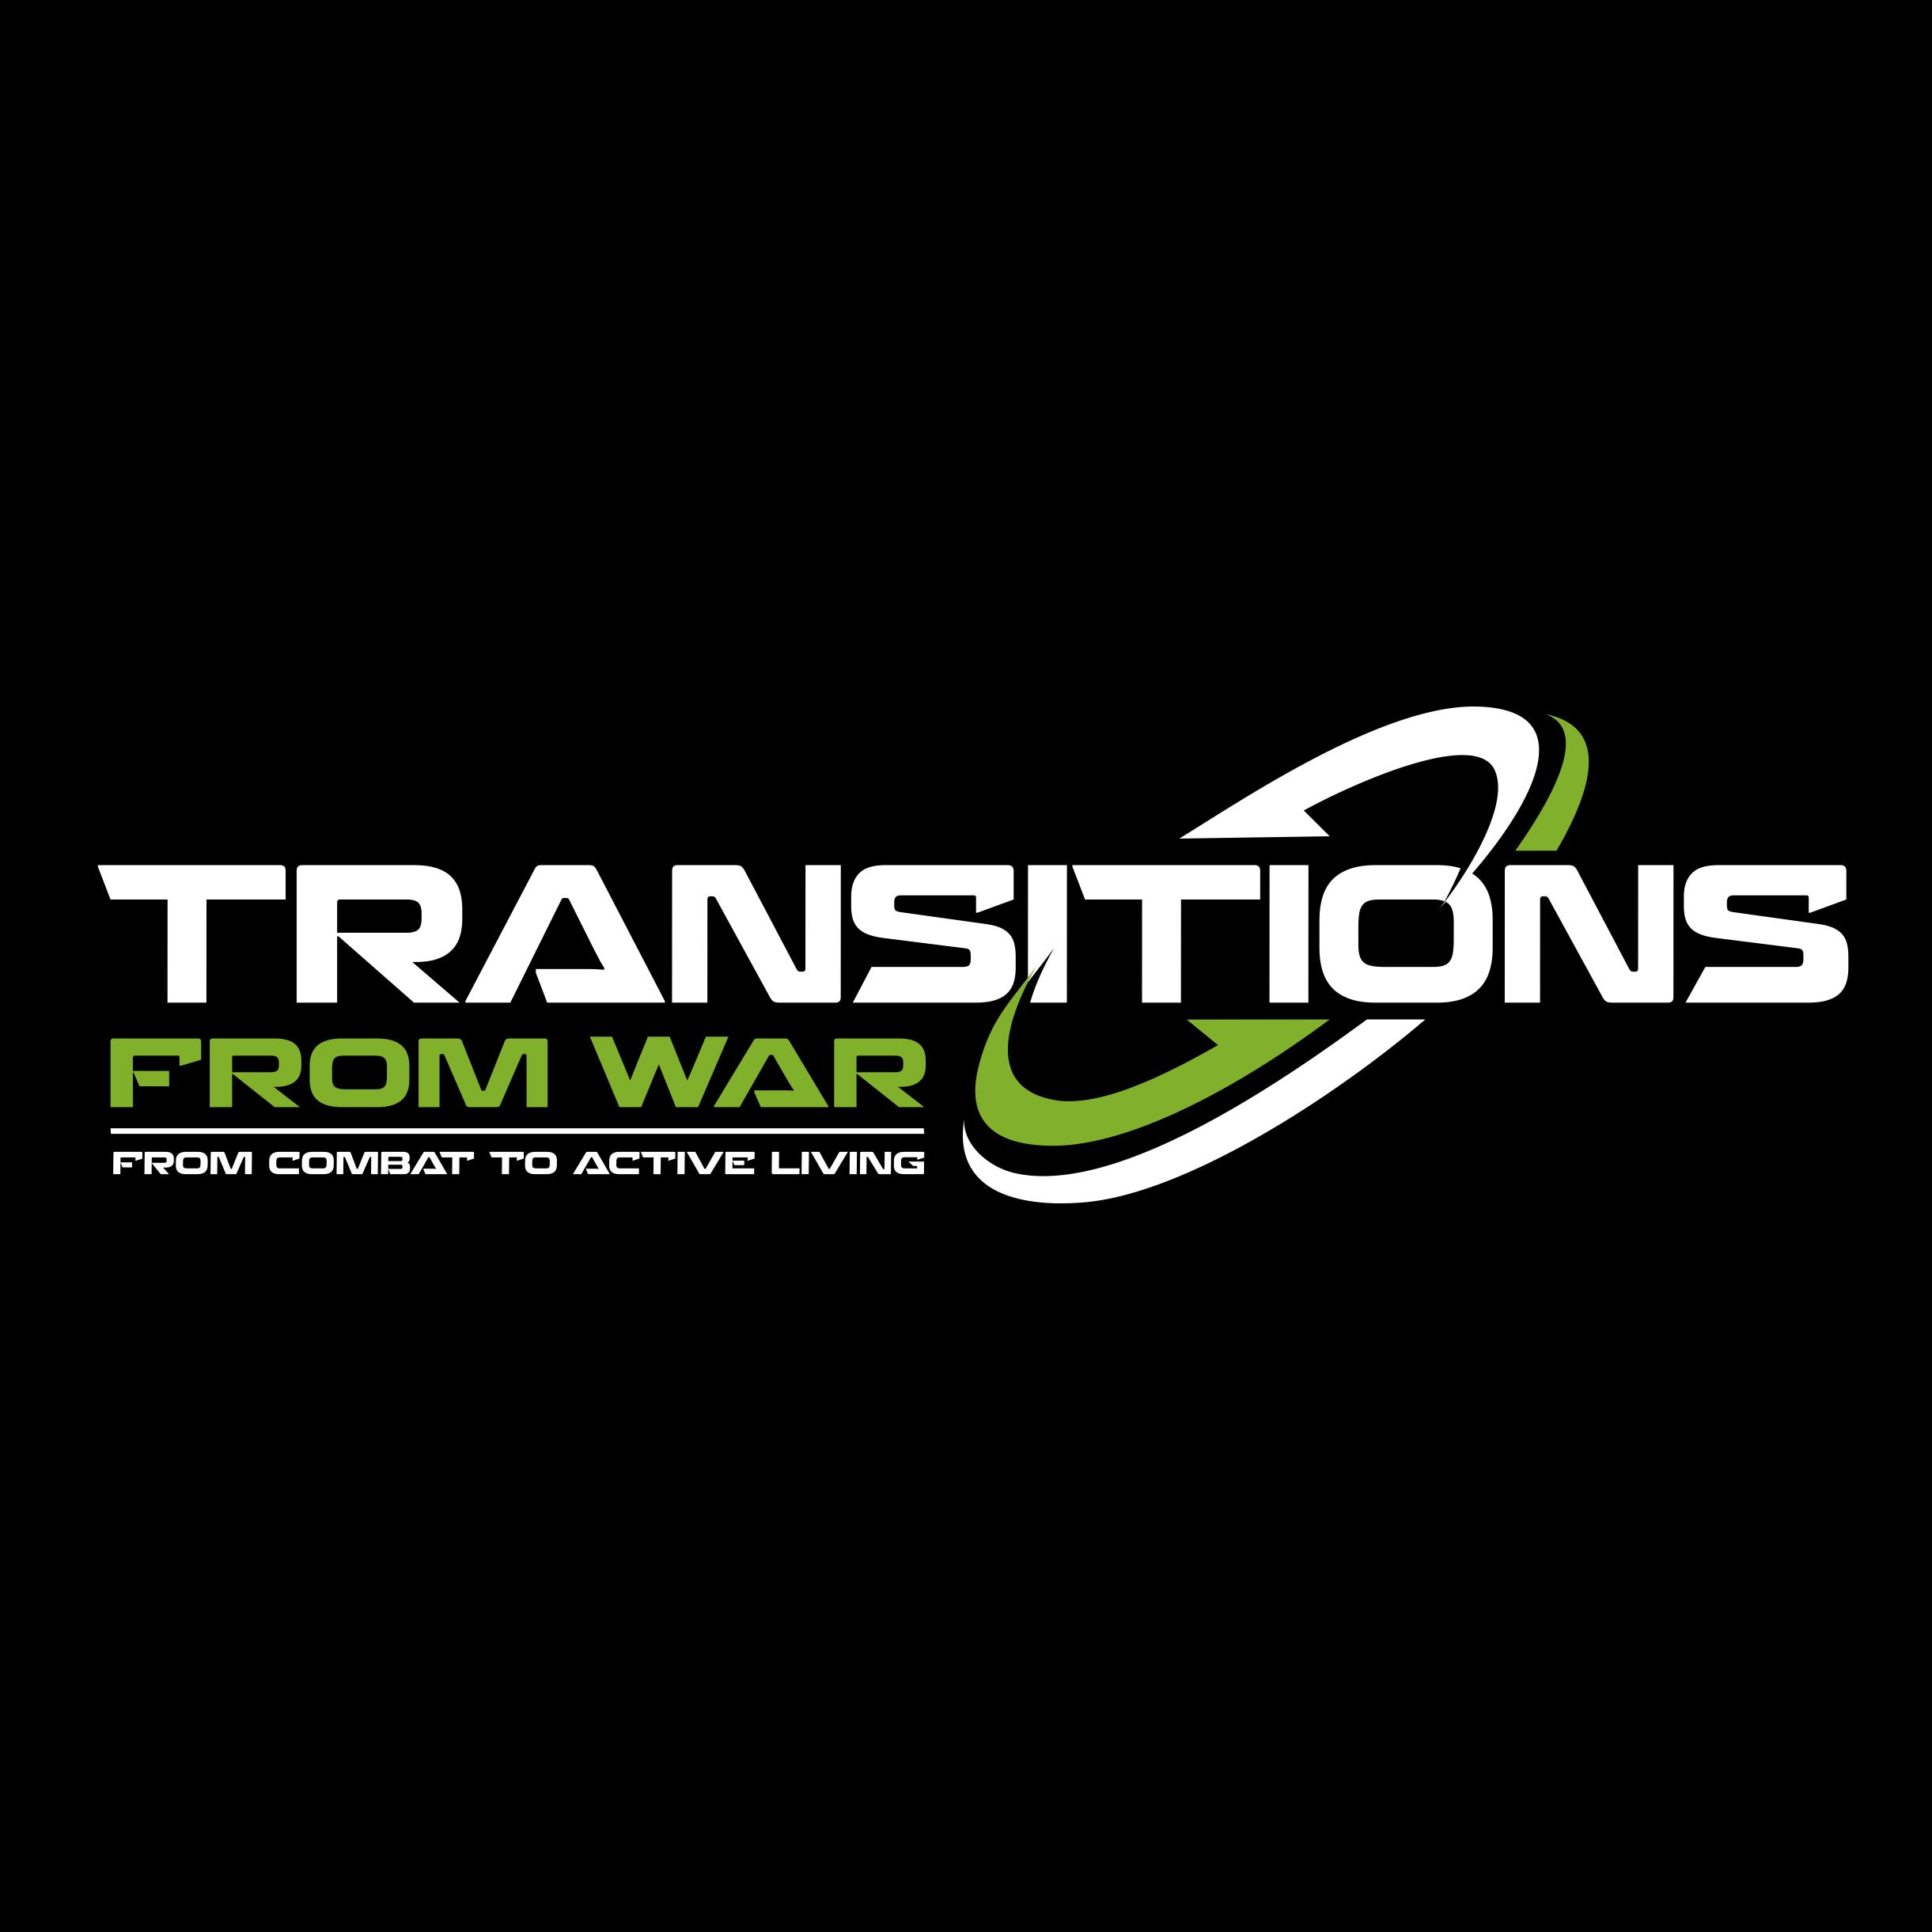 Transitions From War logo